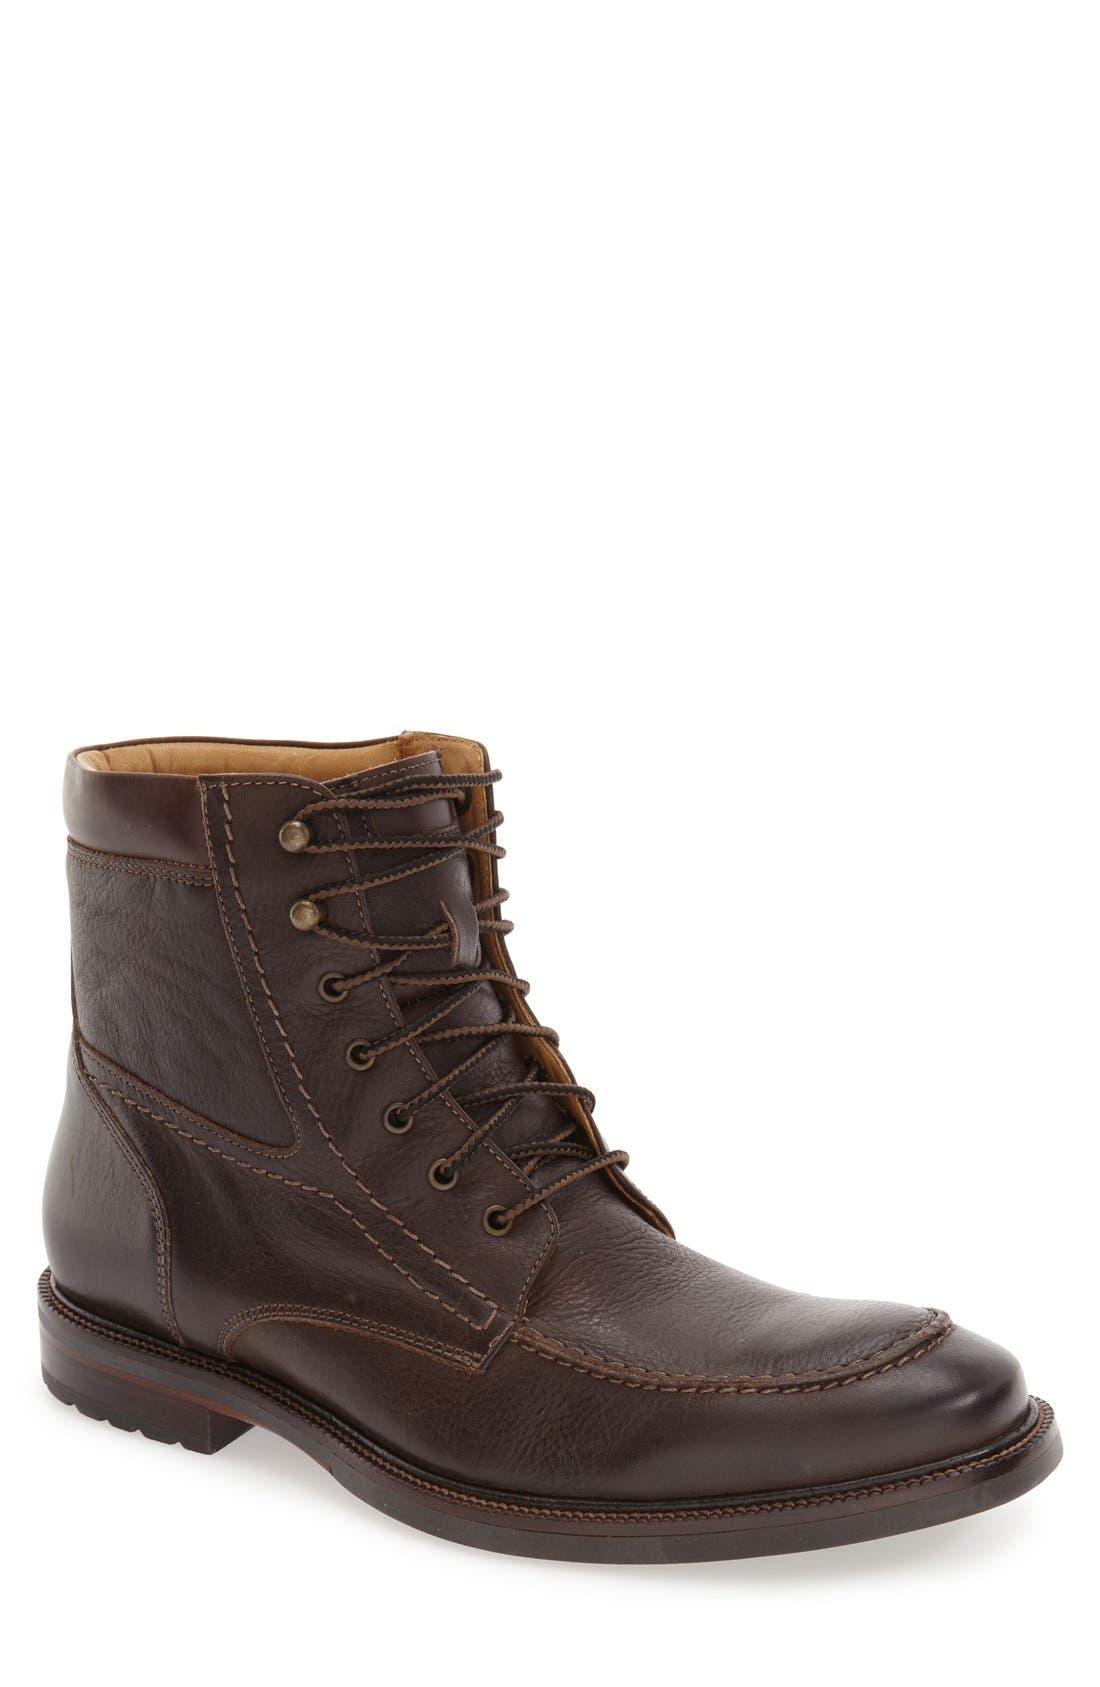 'Baird' Moc Toe Boot,                         Main,                         color, 201